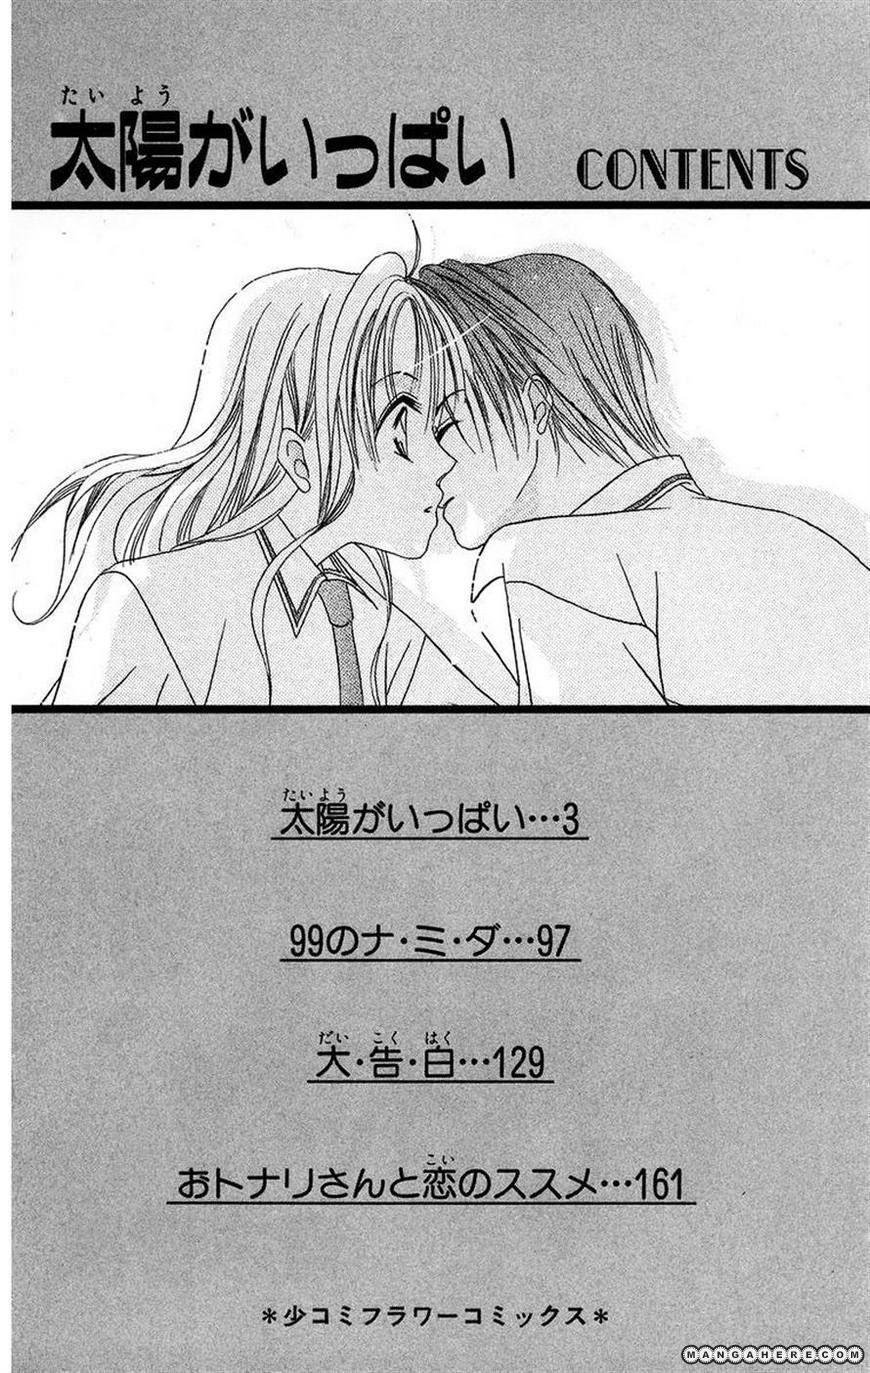 Taiyou ga Ippai 1 Page 2